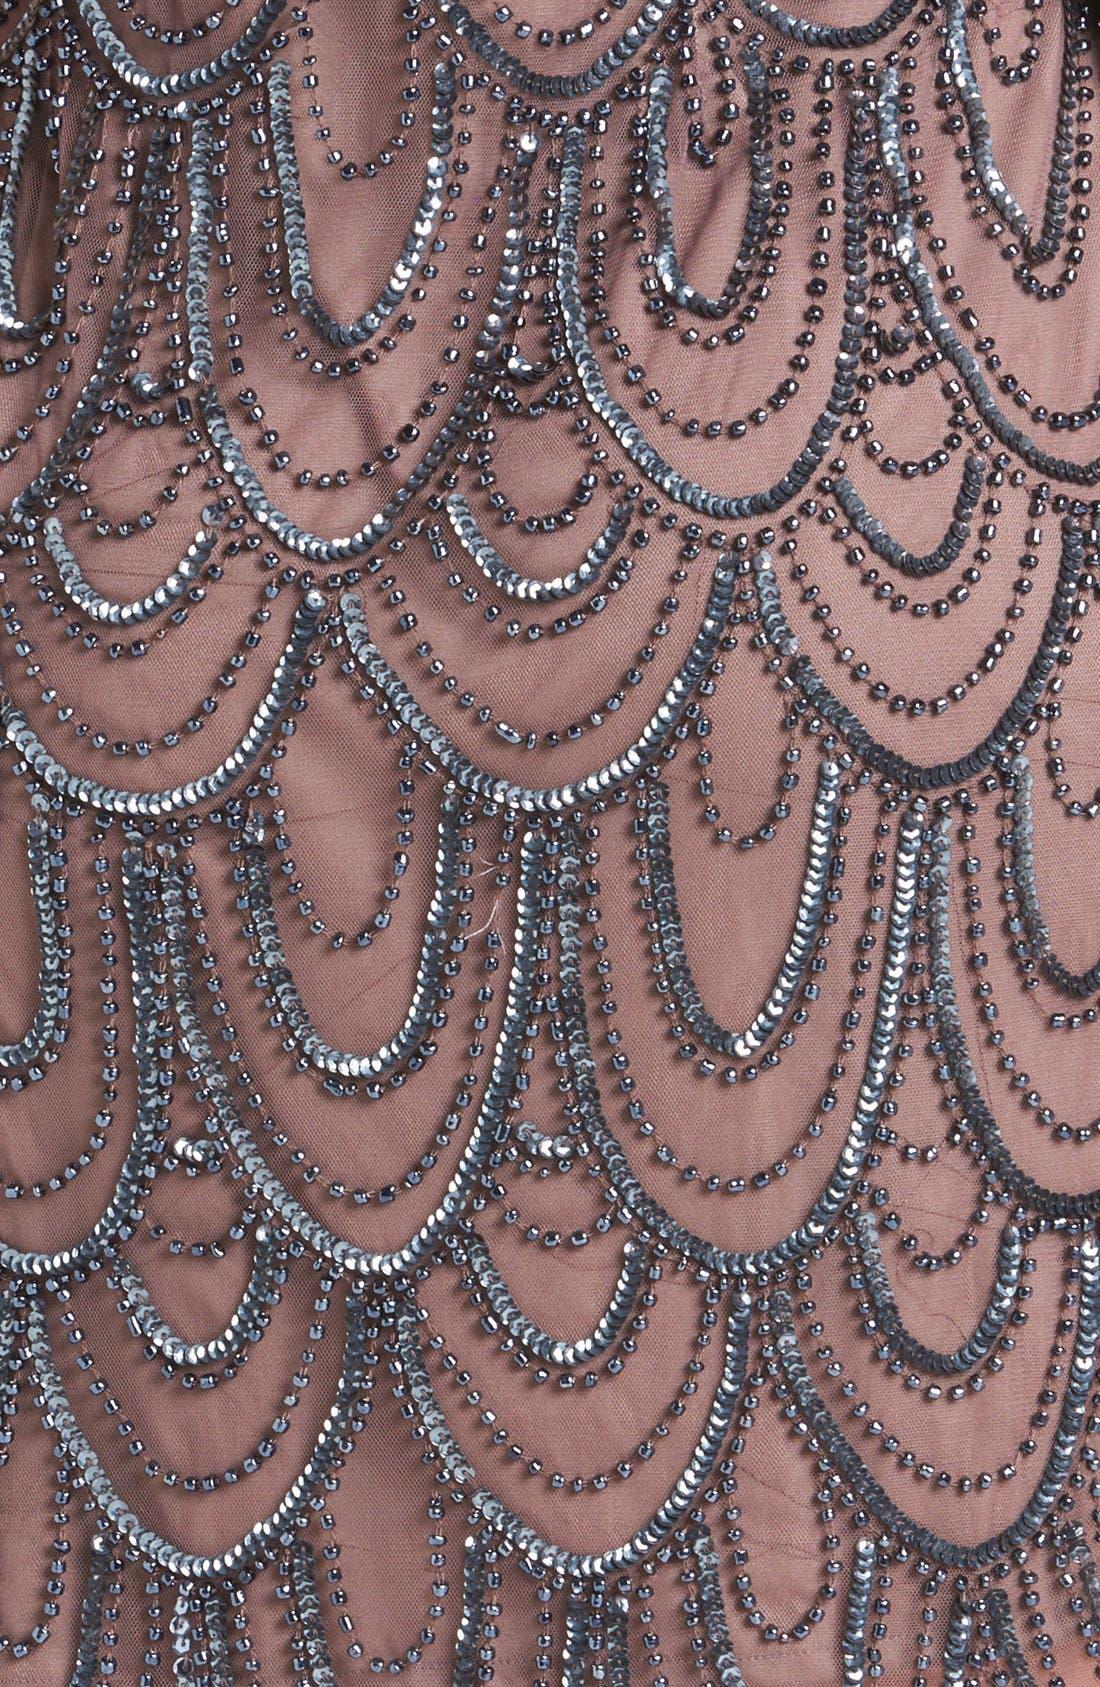 Embellished Mesh Sheath Dress,                             Alternate thumbnail 30, color,